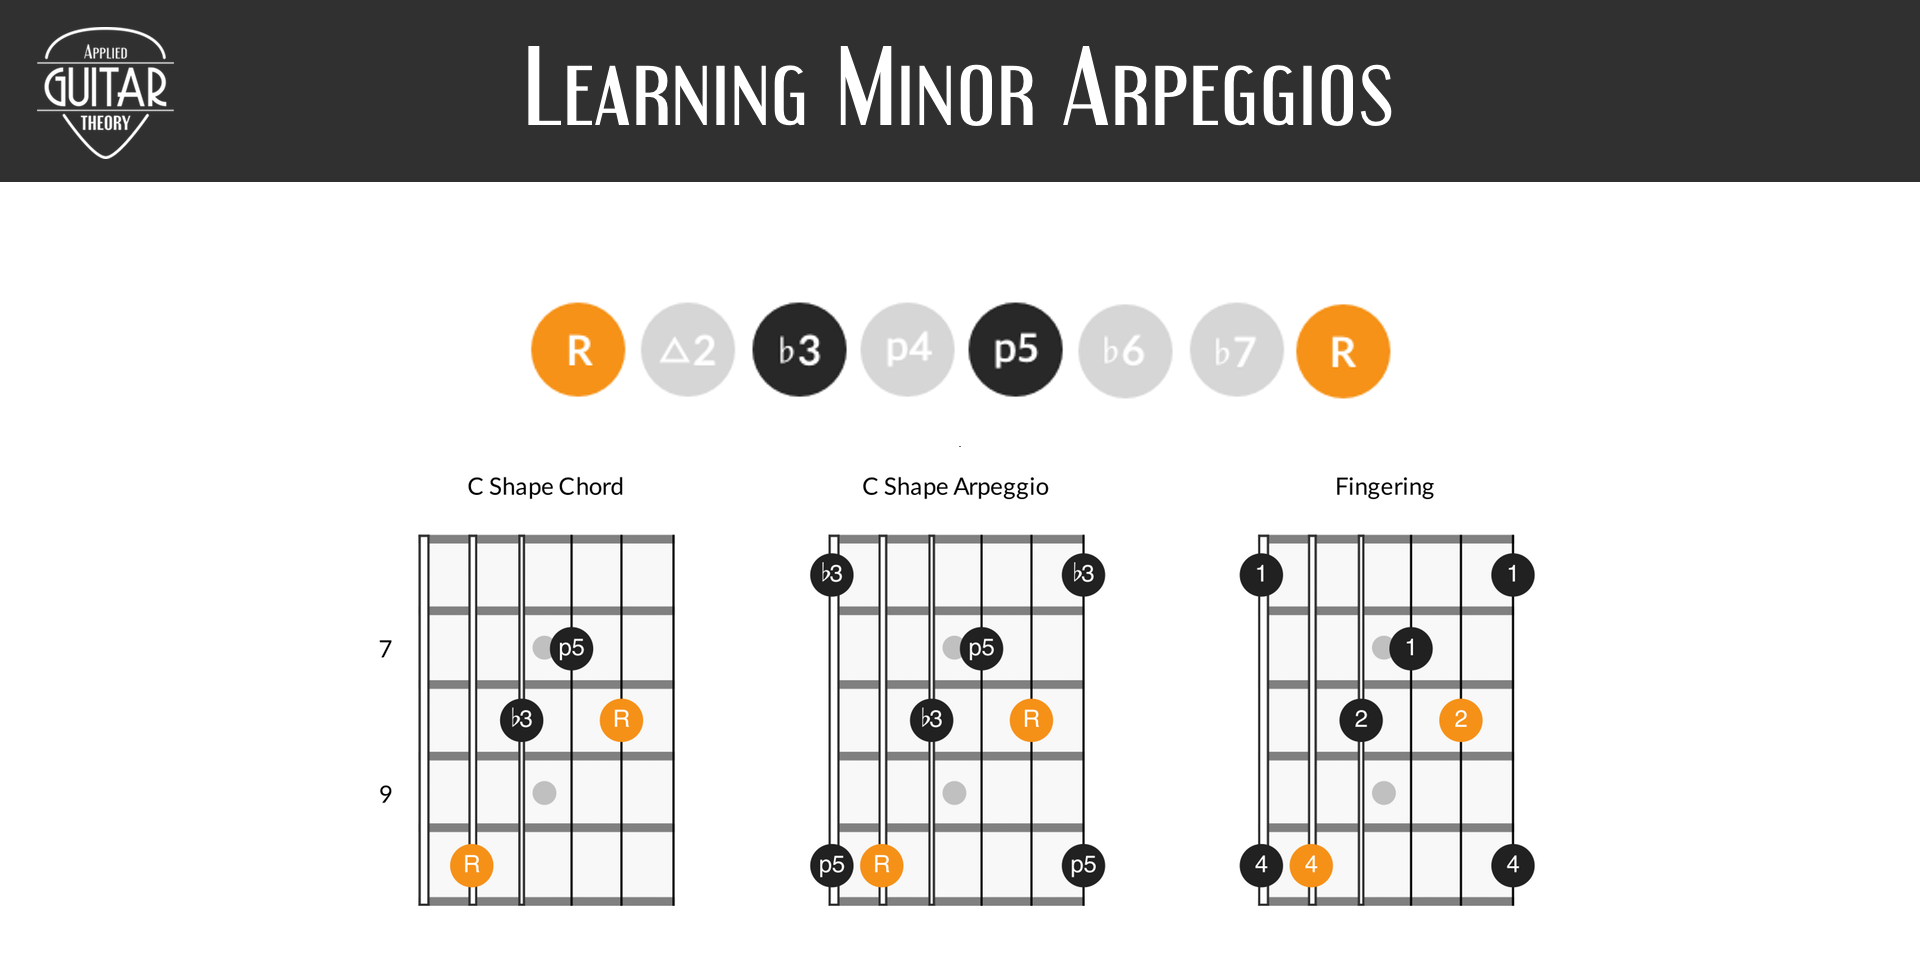 Learning minor arpeggios